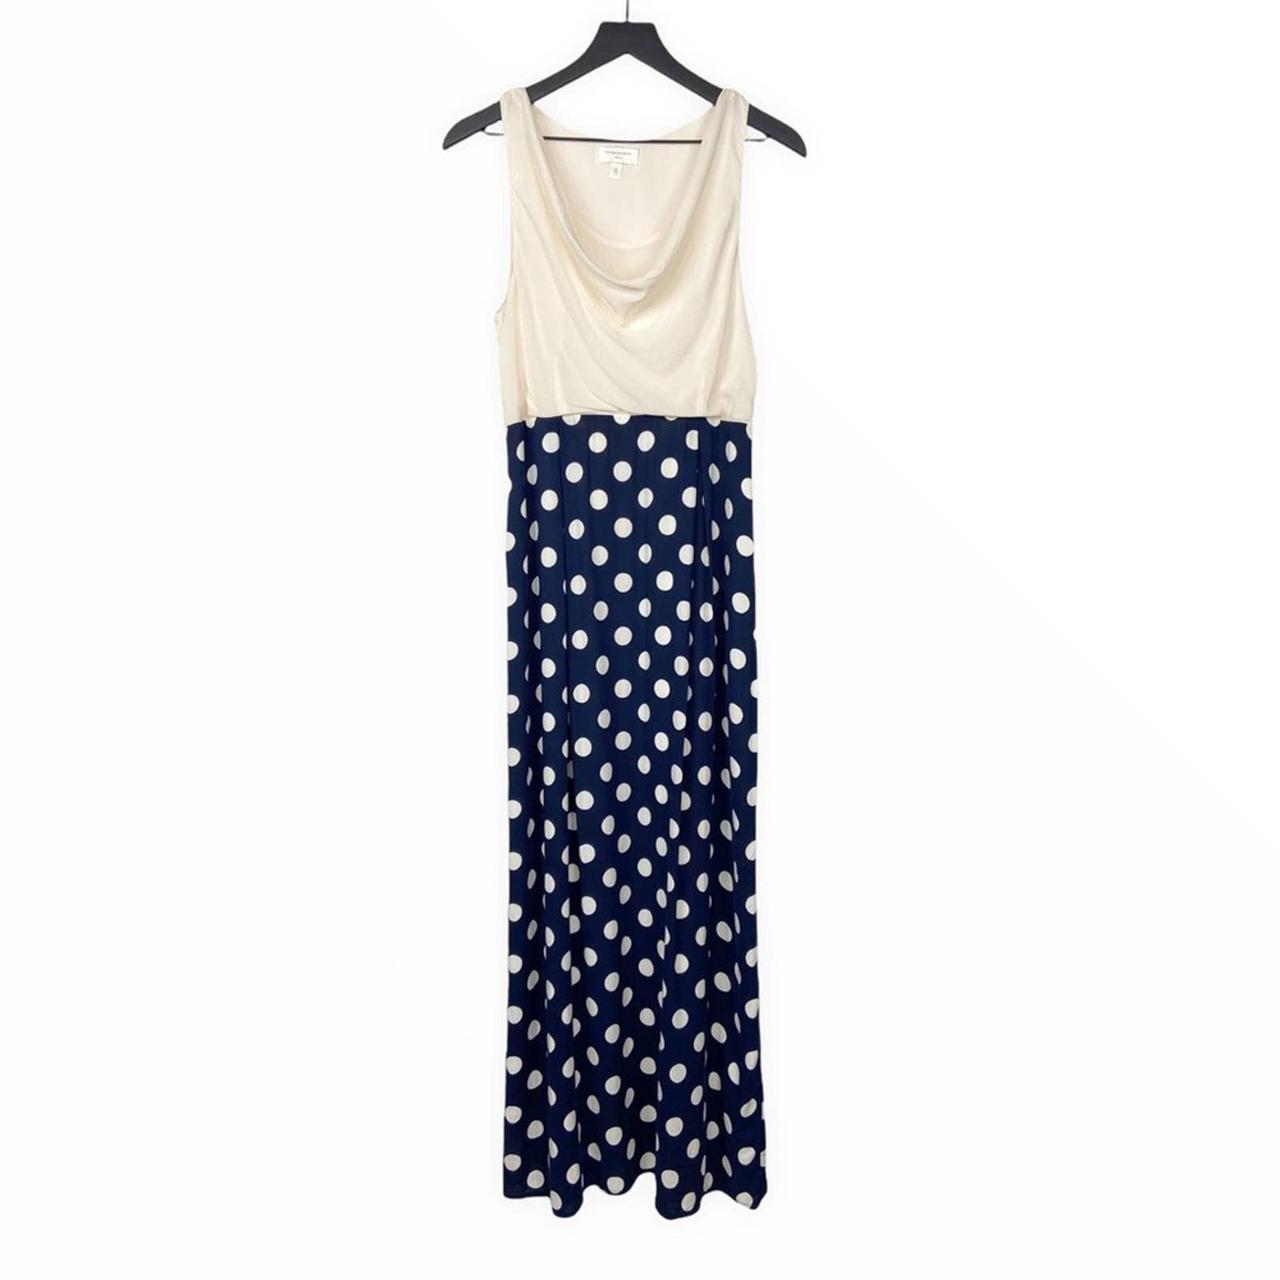 Product Image 1 - Maxi Silk Dress Polka Dot